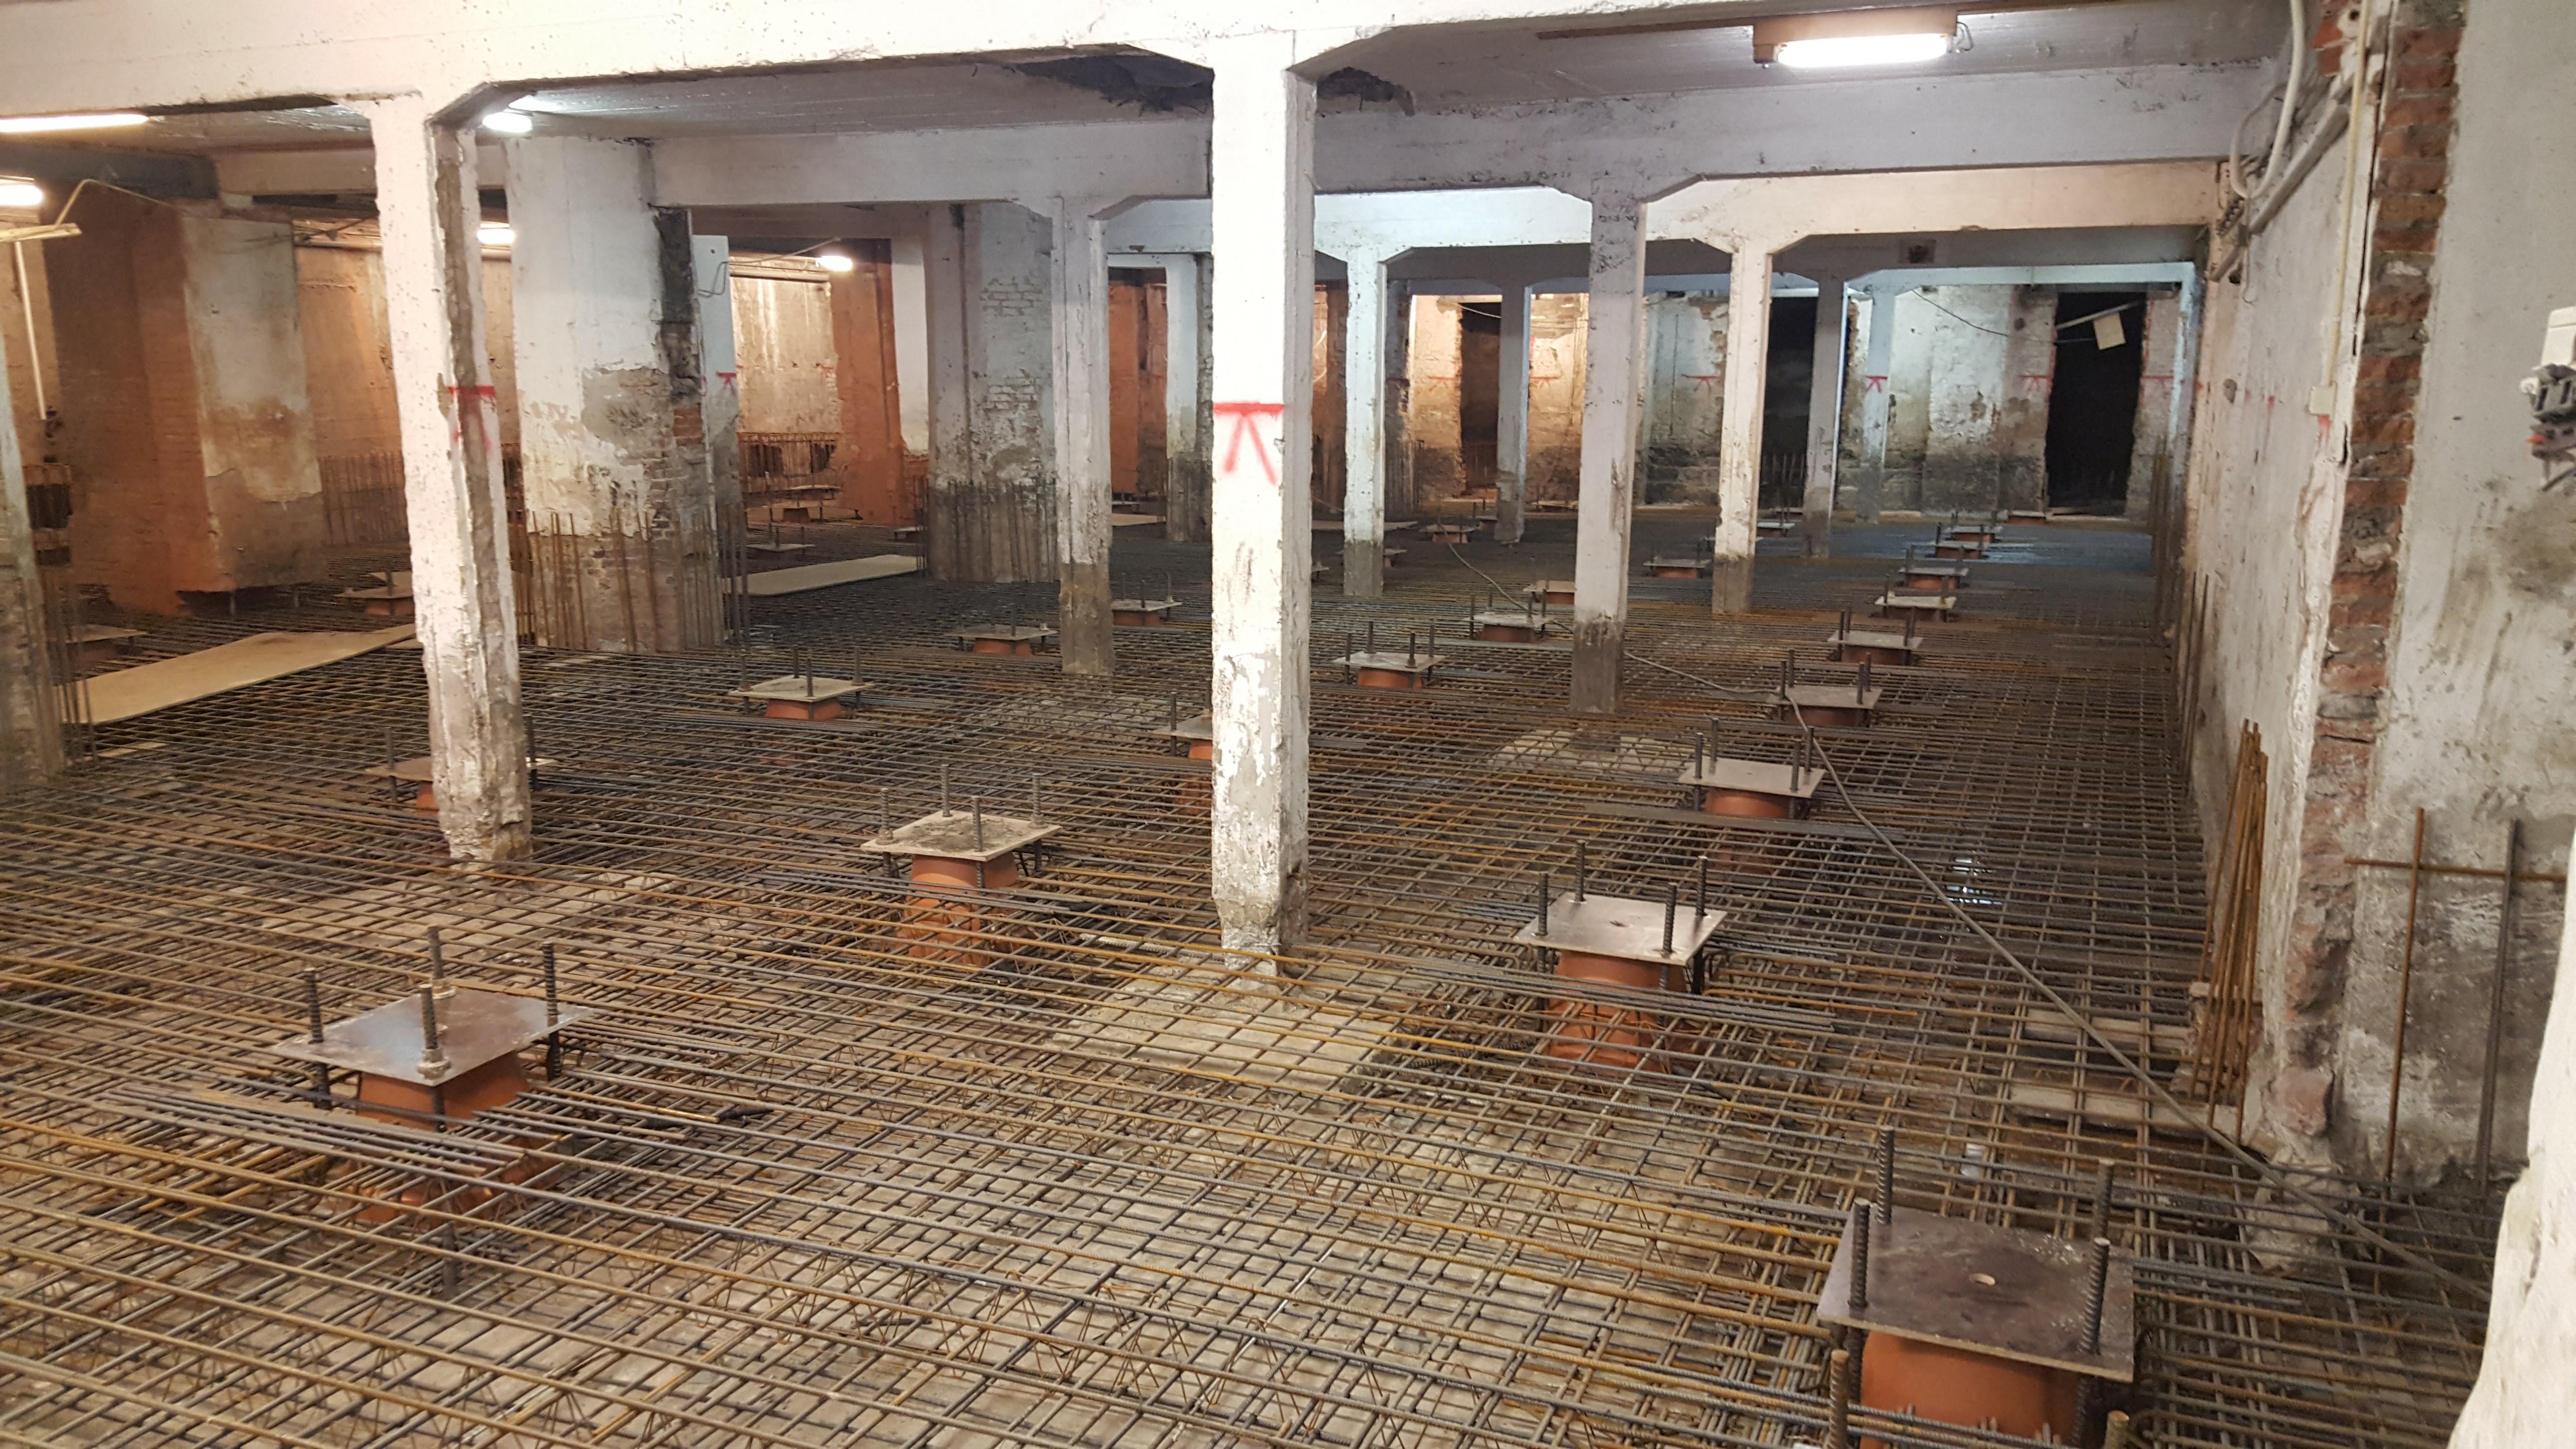 149 drukpalen voorkomen schade monumentale kerk